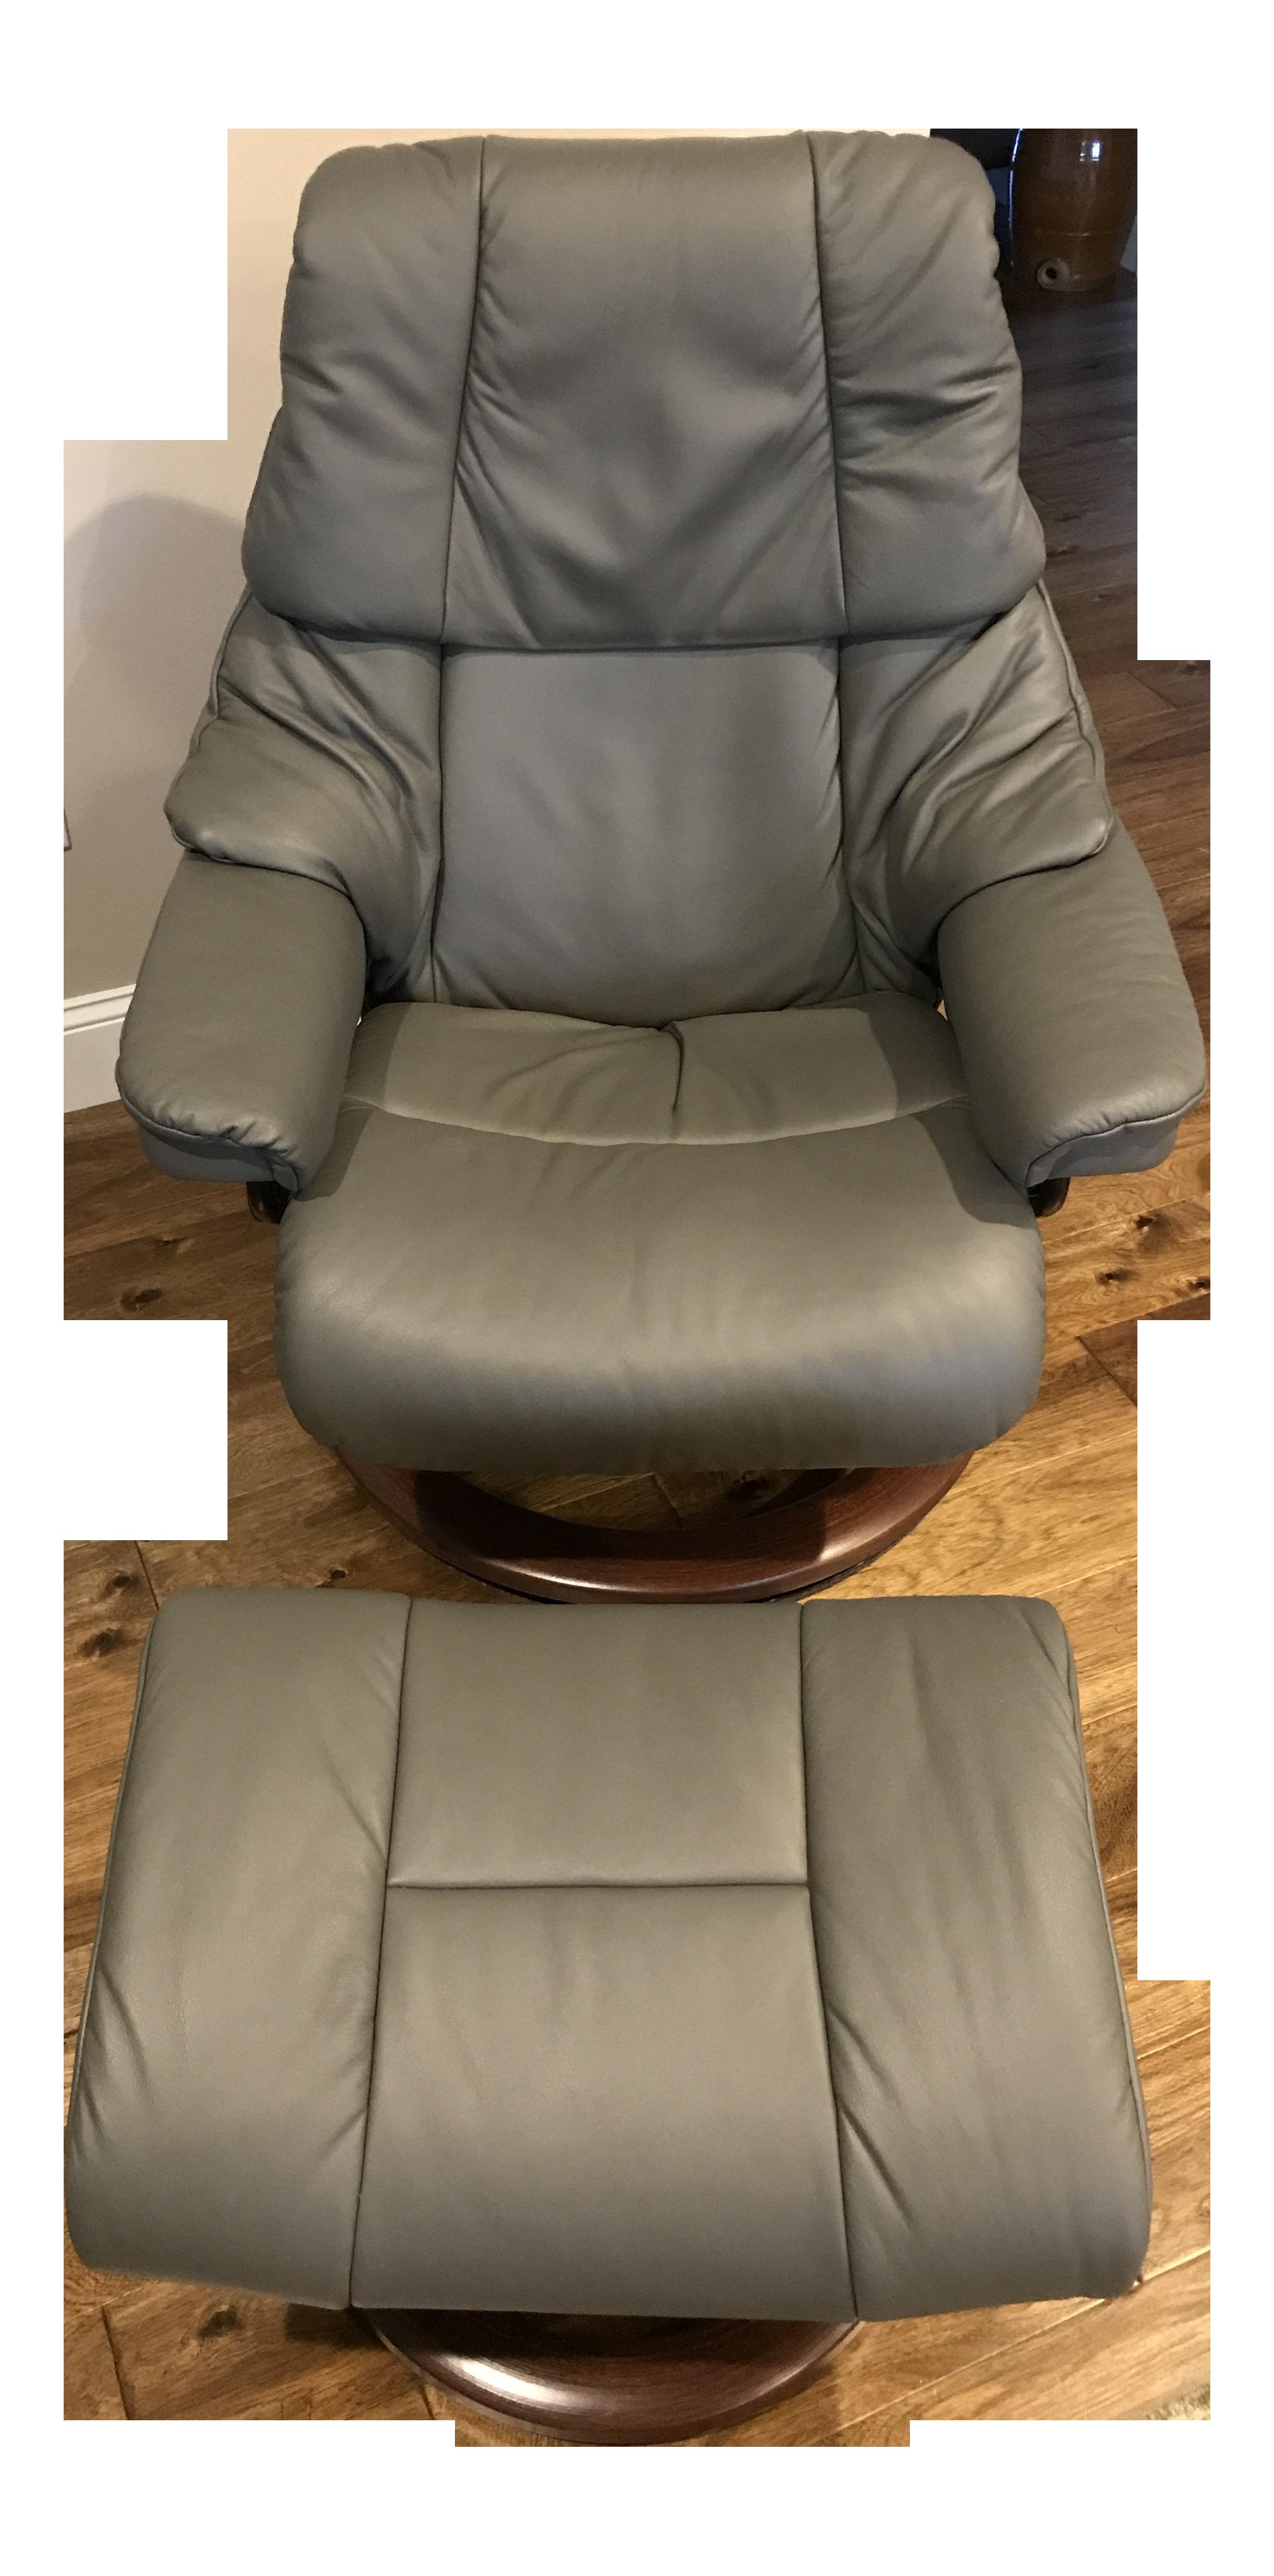 Ekornes Stressless Sofa Repair Ekornes Chair Ekornes Chair Gurden